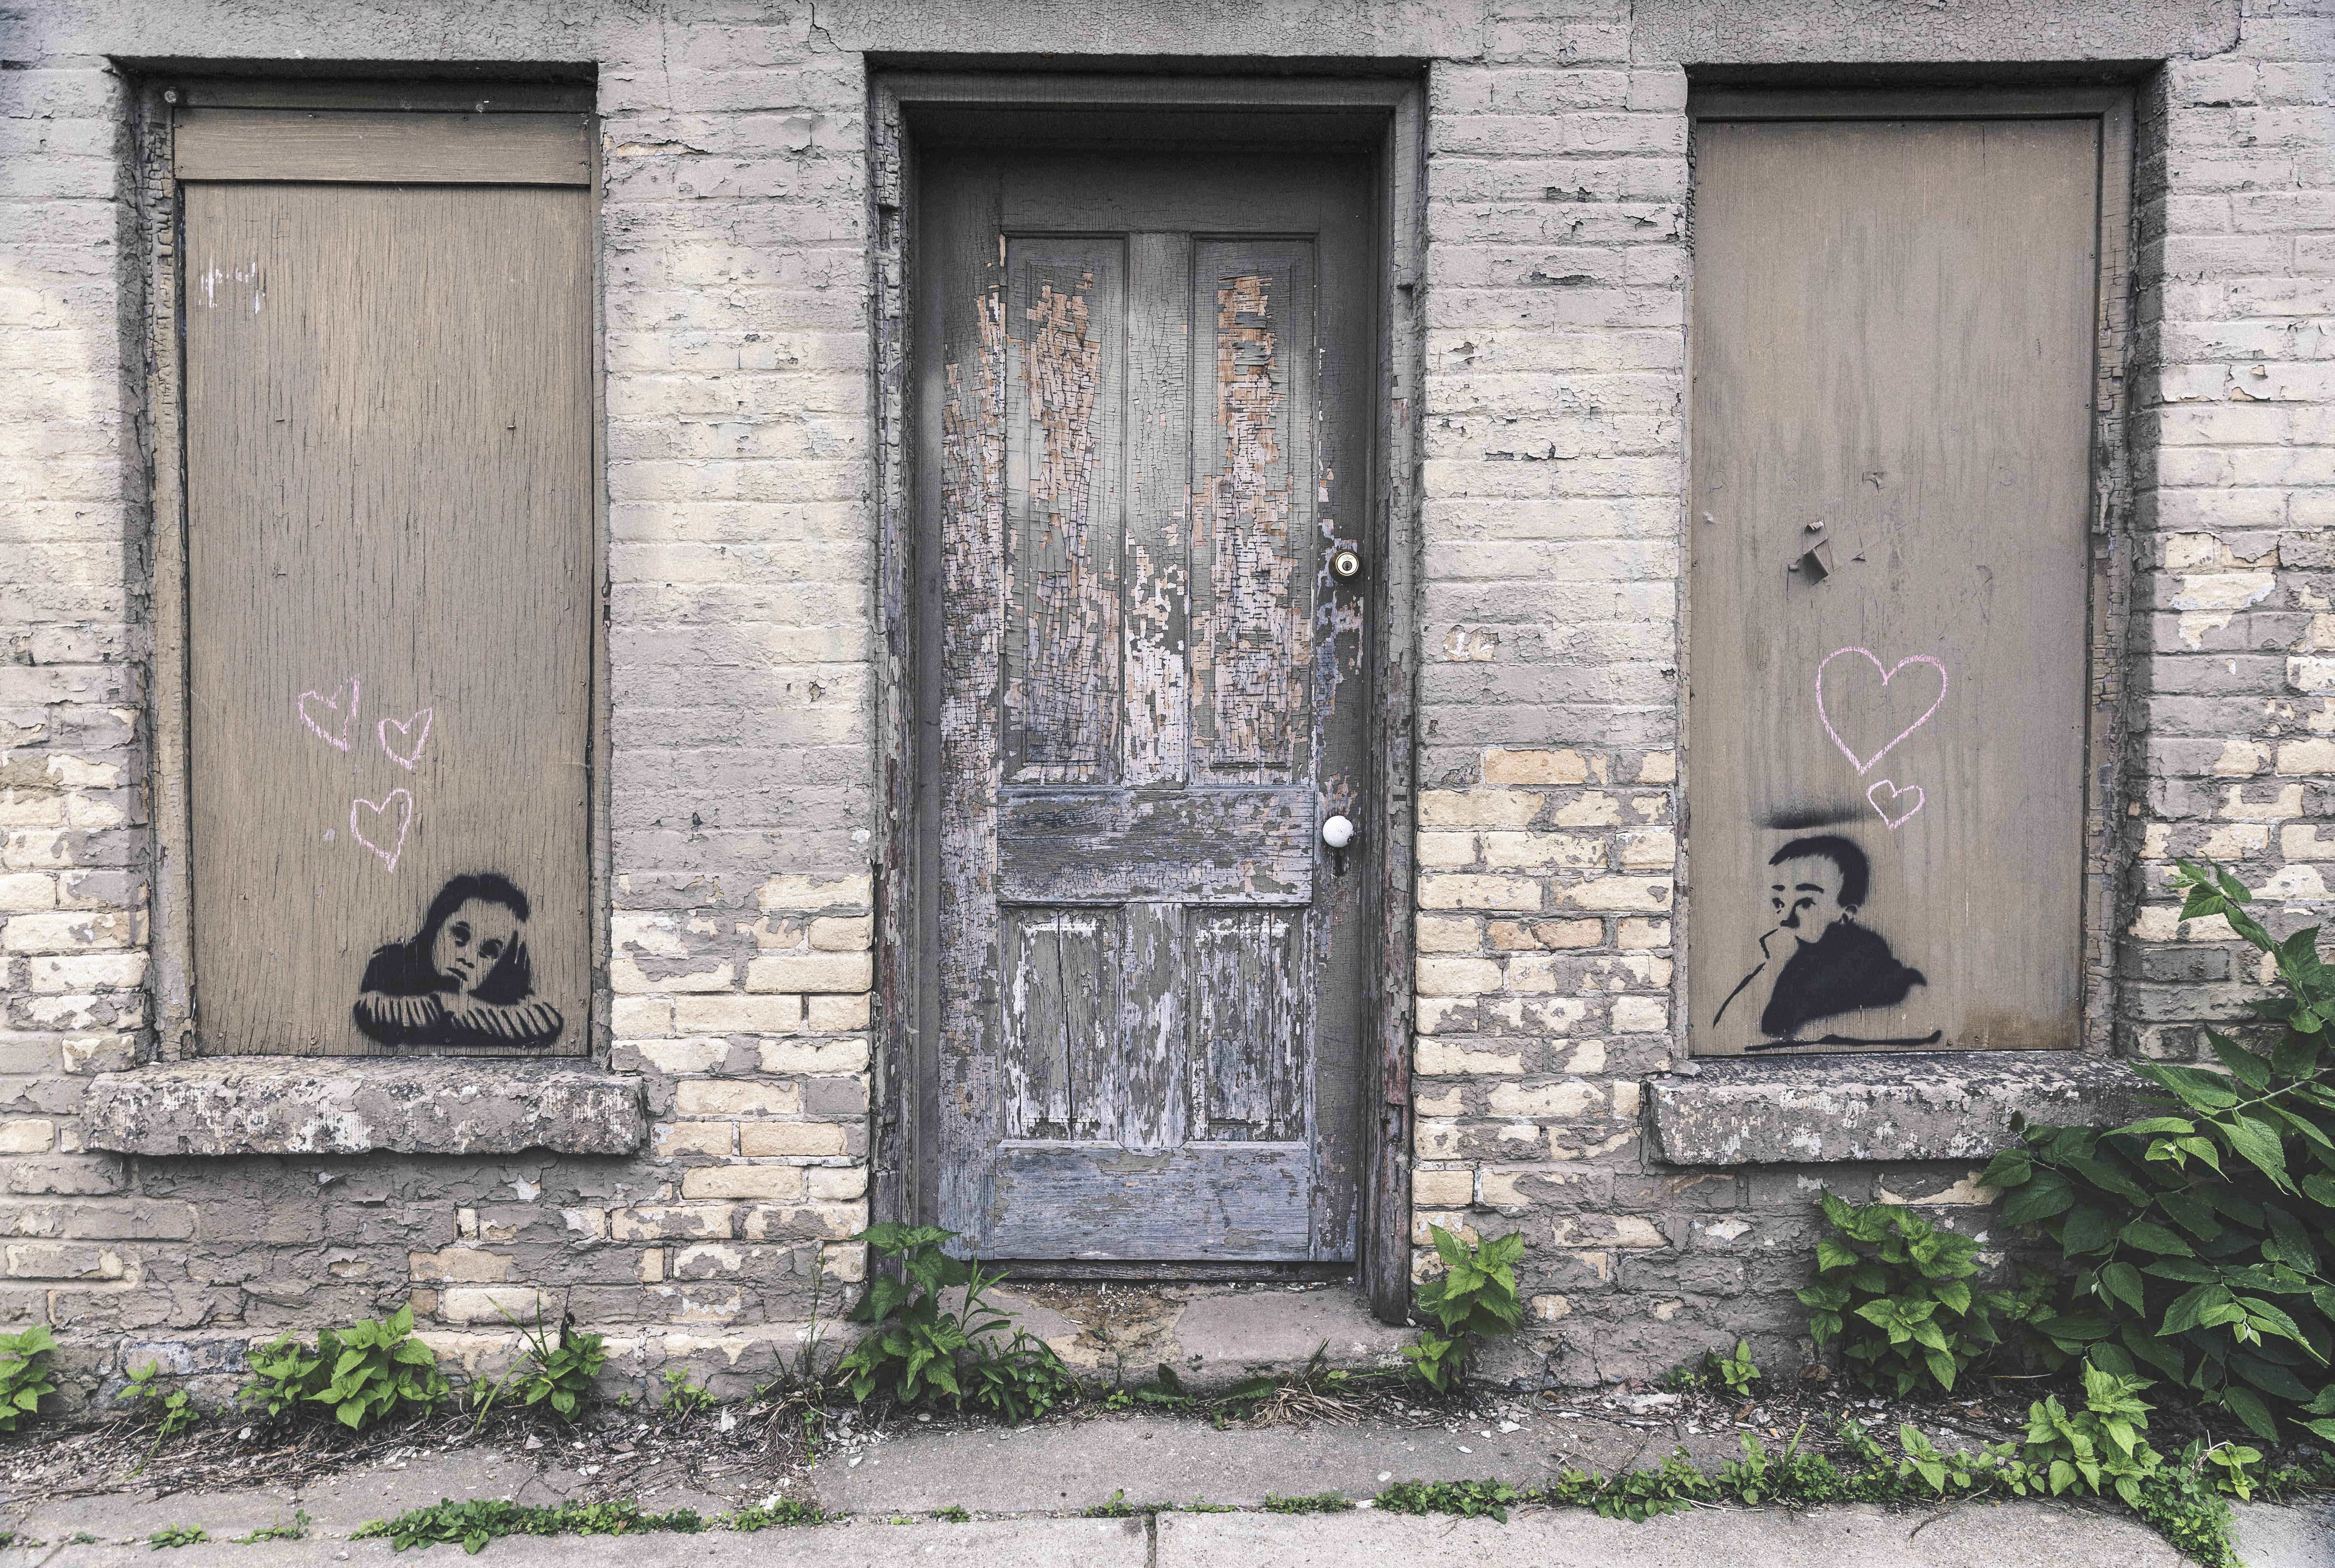 gratisography-xoxo-love-graffiti